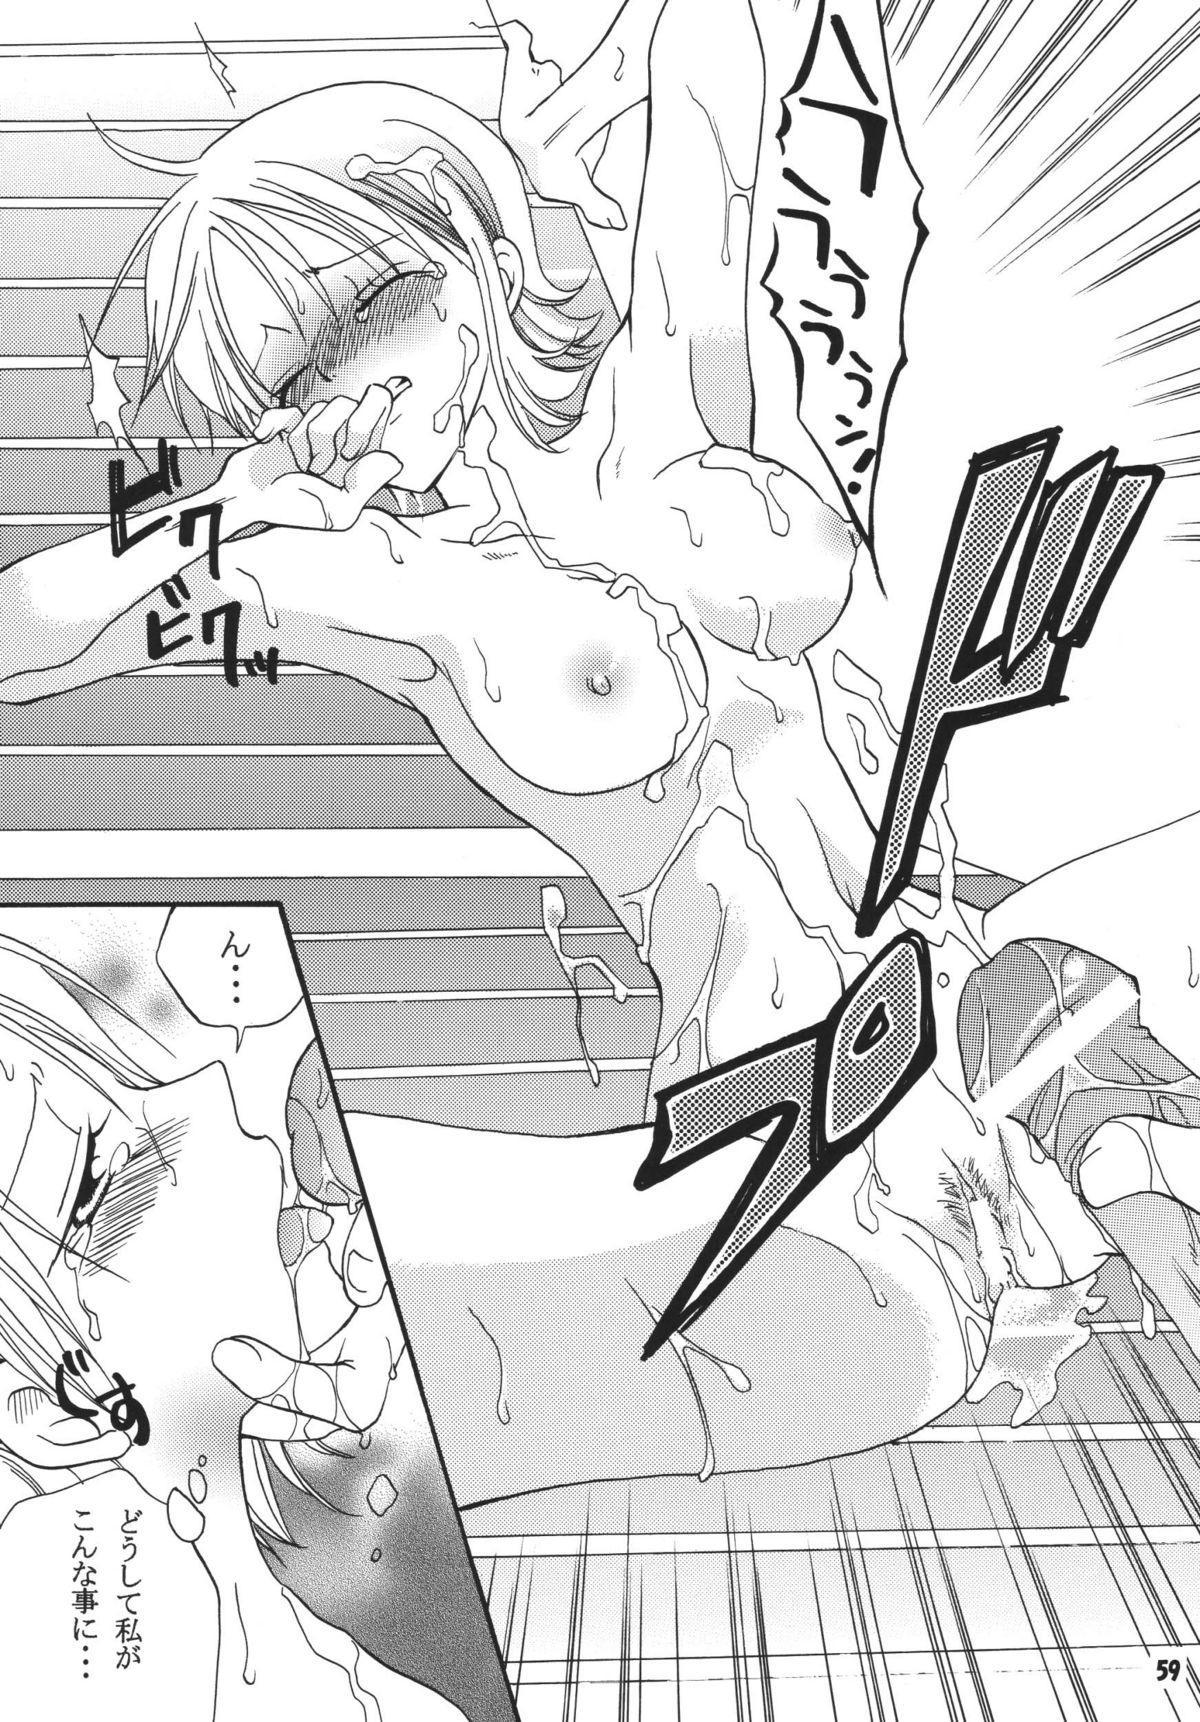 Kaizoku Musume. DX 57